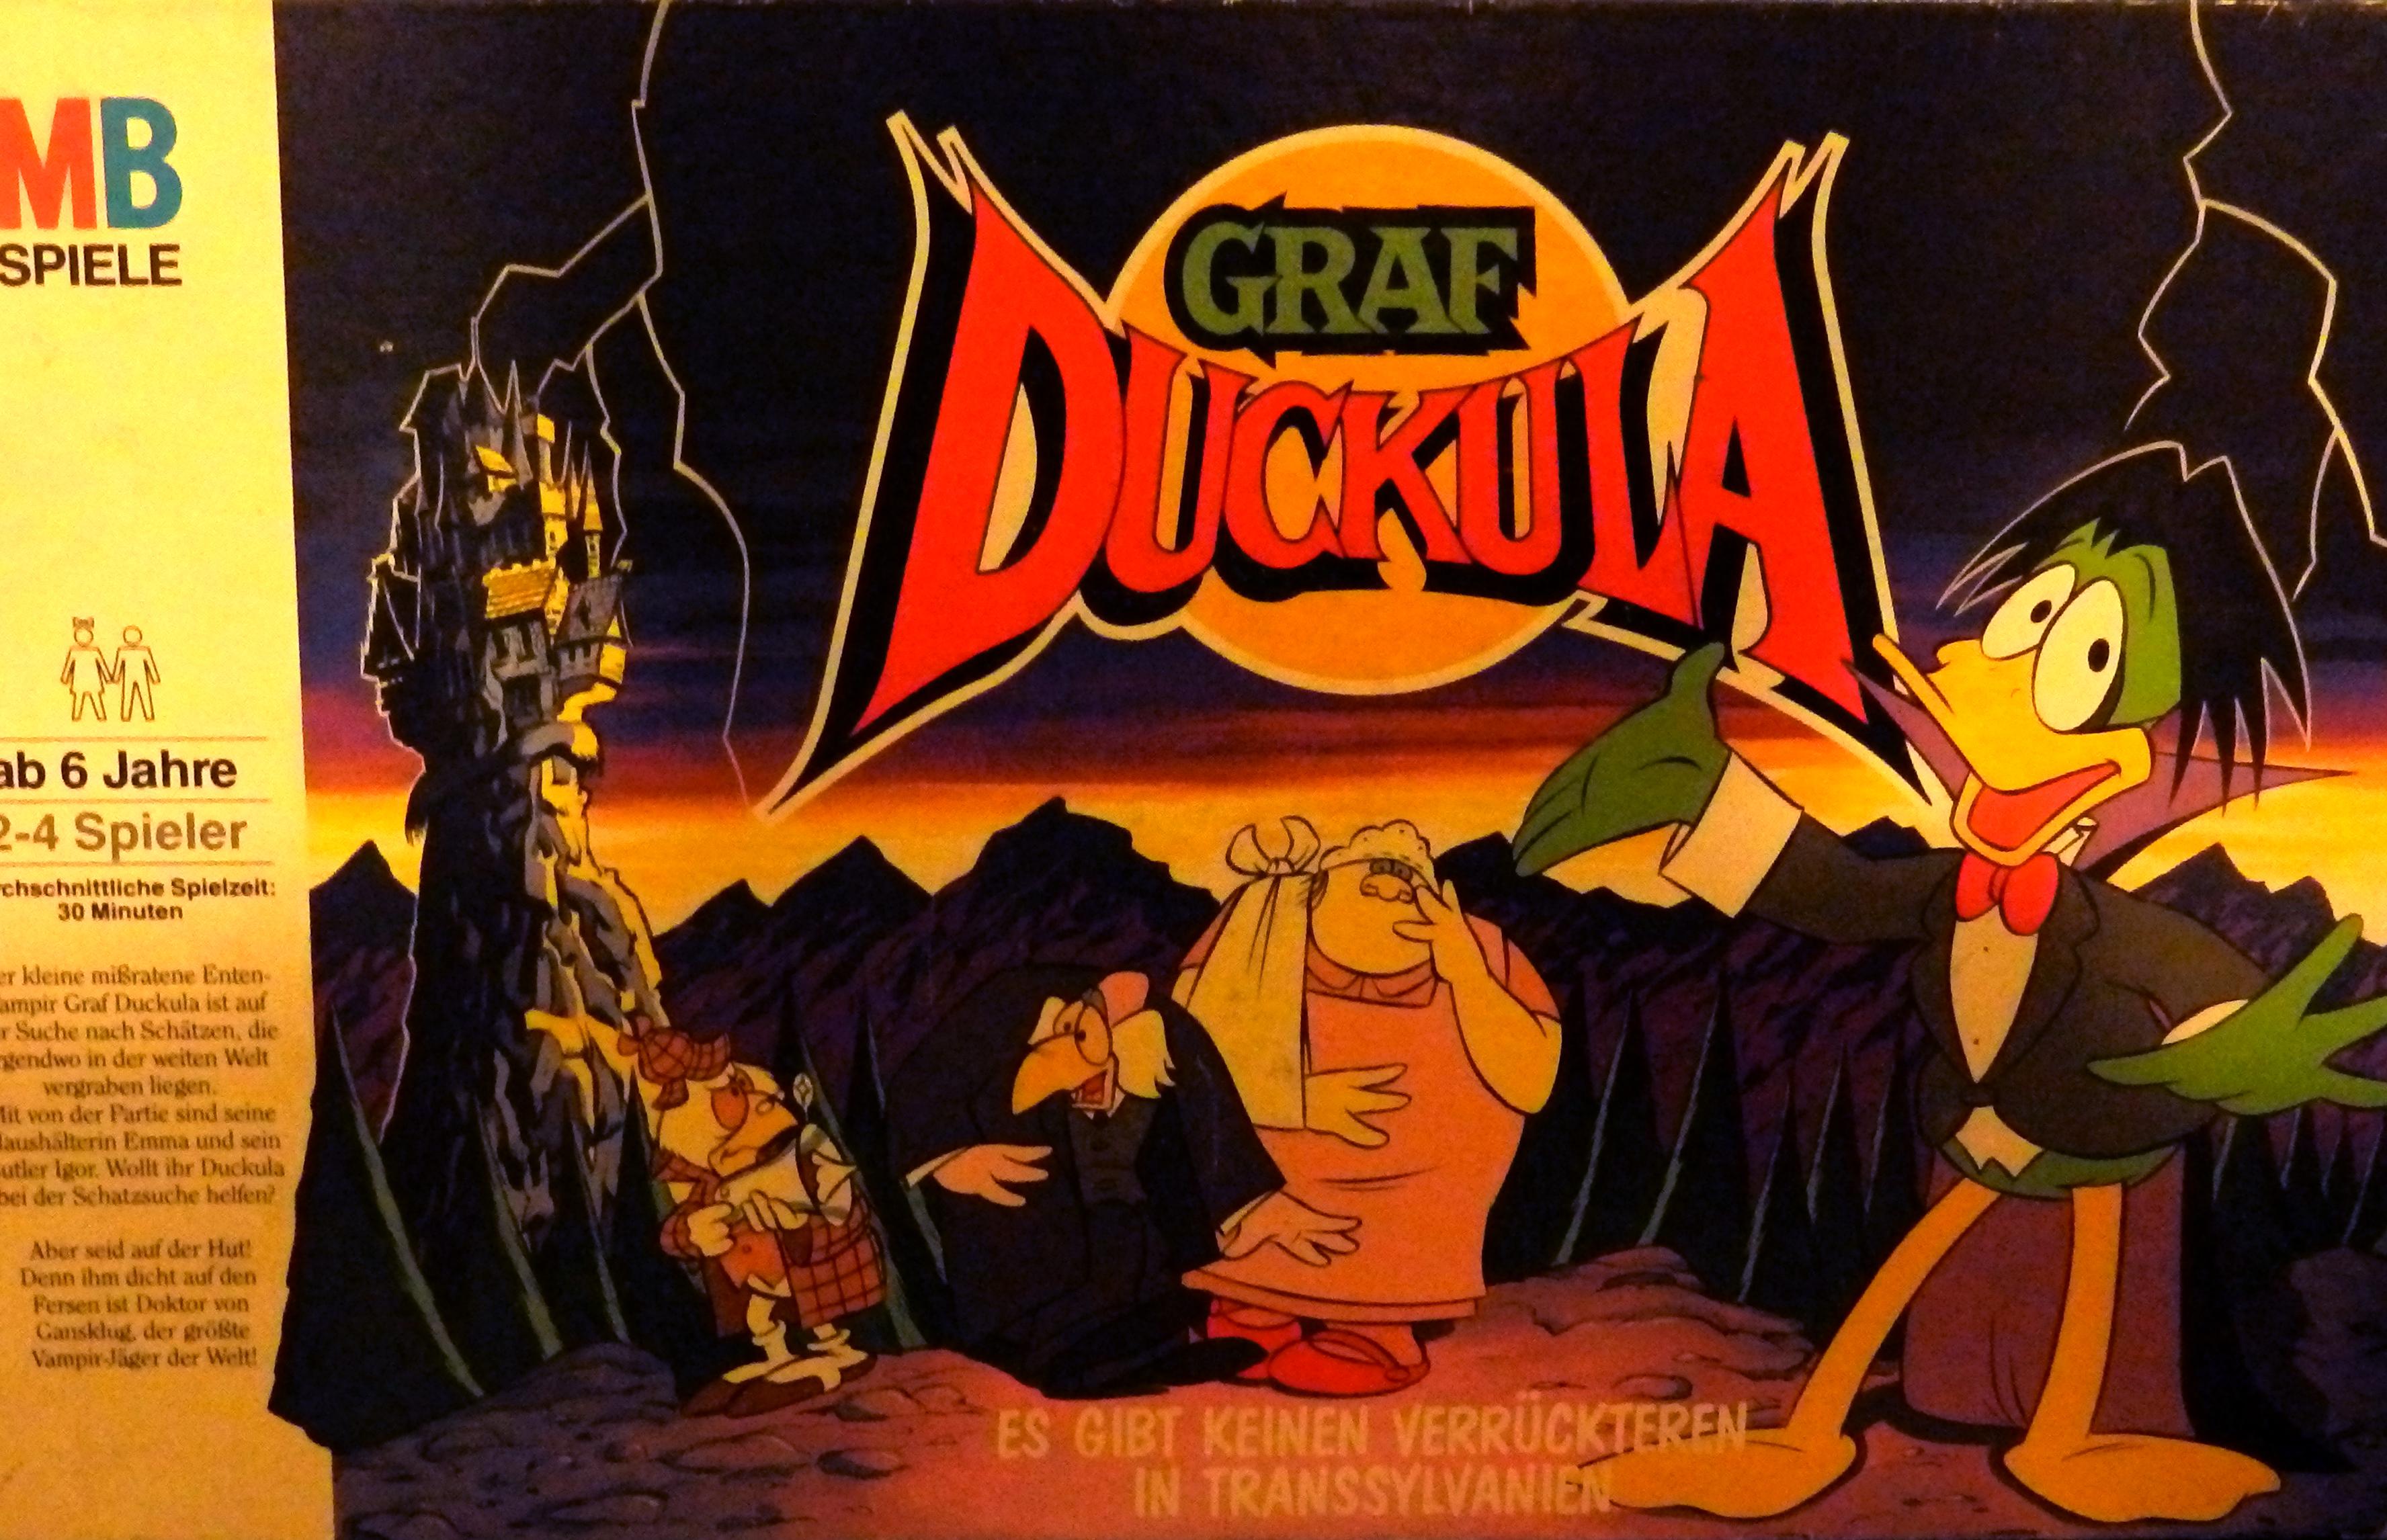 Graf Duckula